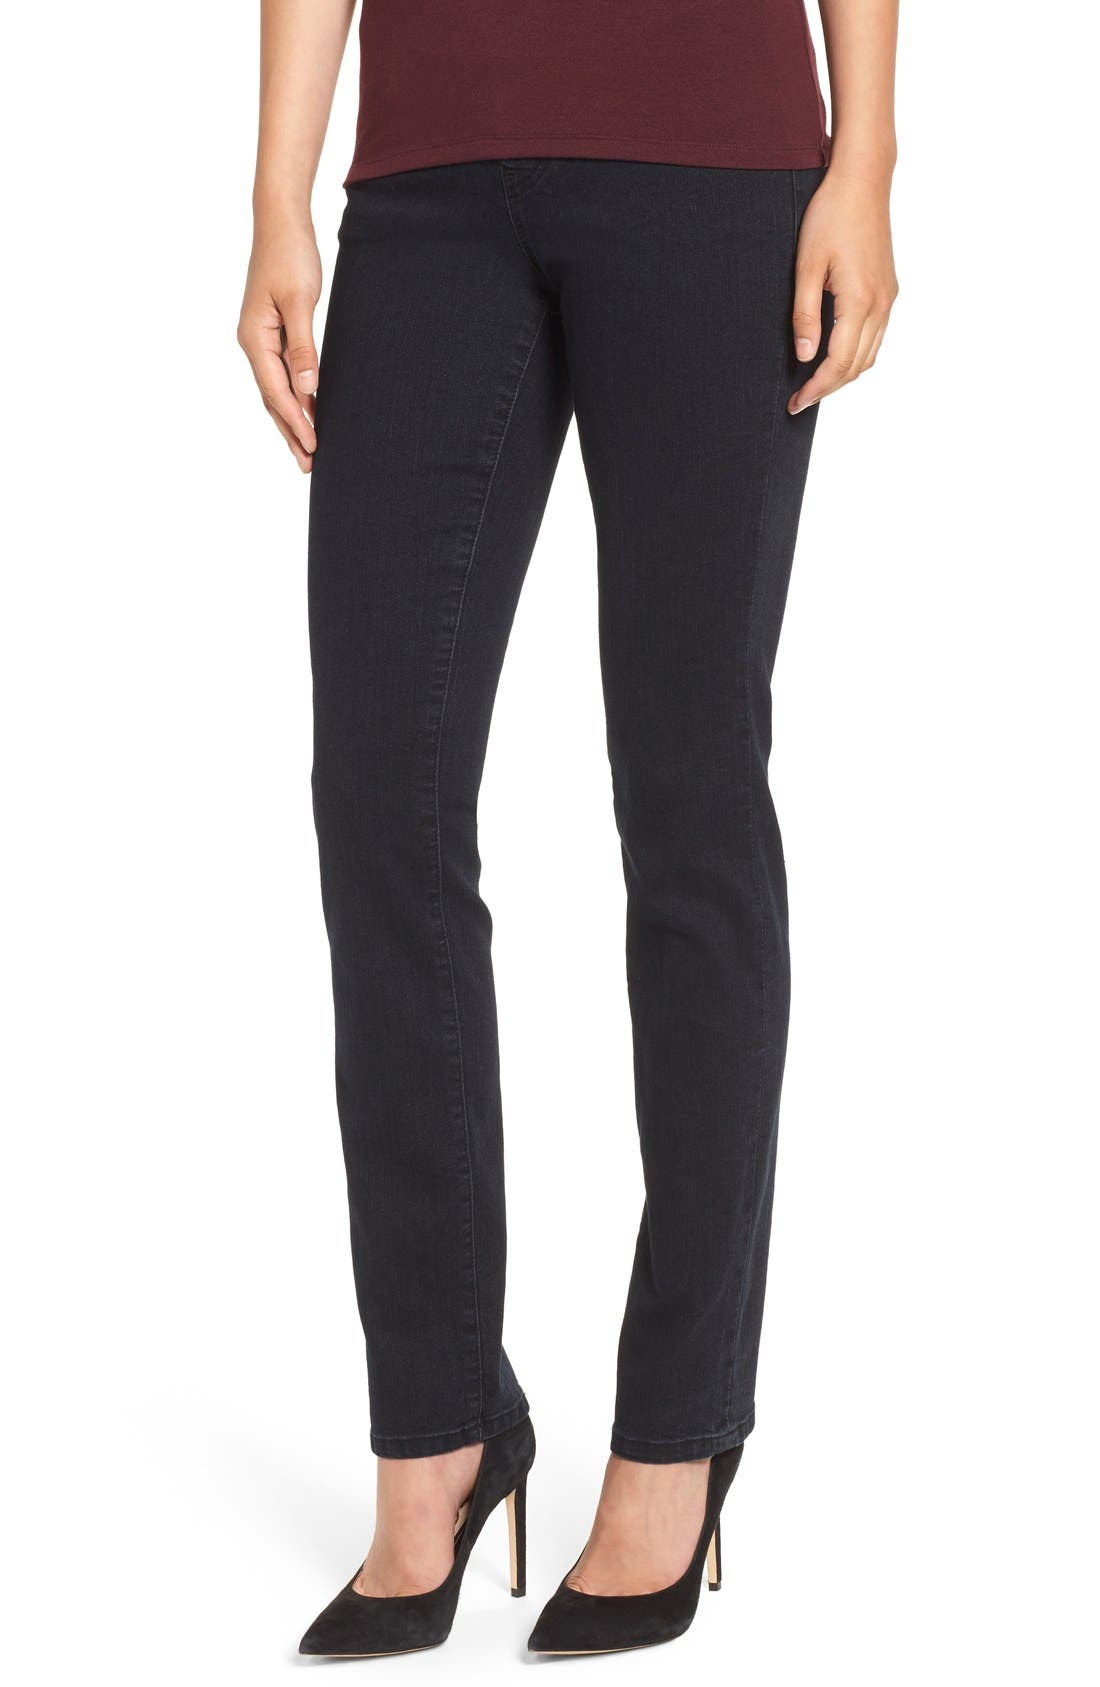 JAG JEANS 'Peri' Straight Leg Pull-On Jeans